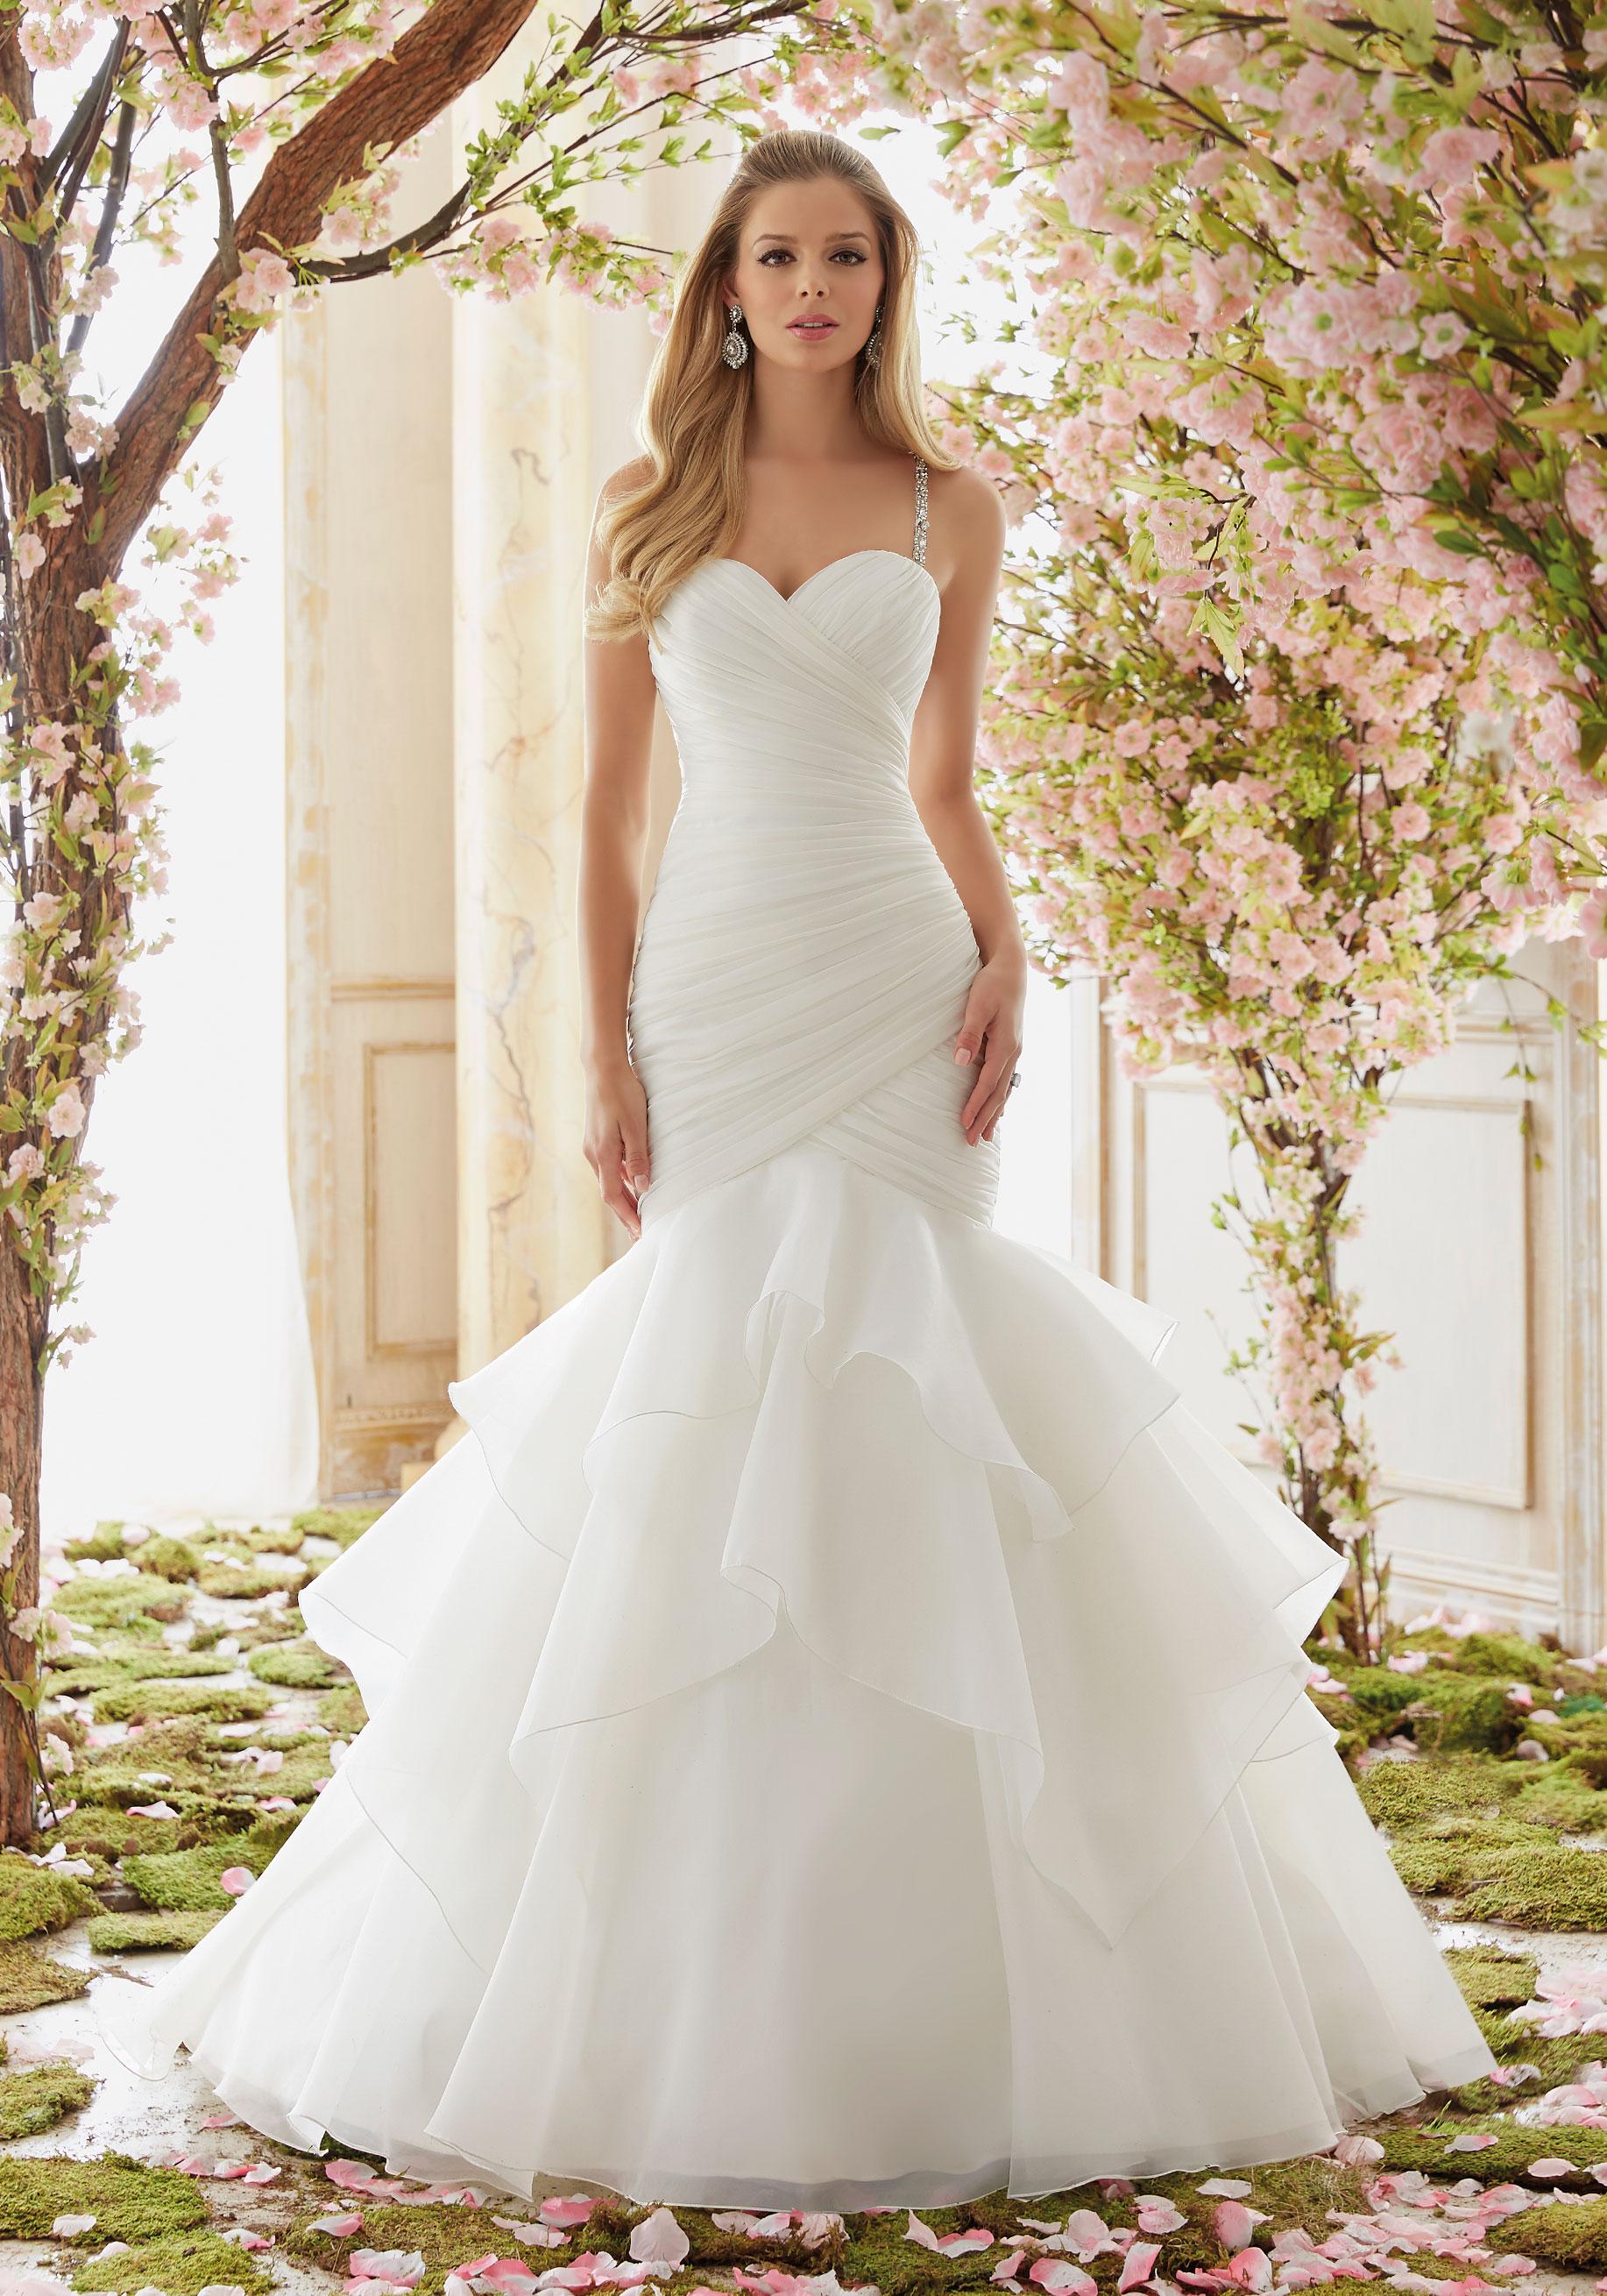 Wedding Dresses Mermaid.Mori Lee 6833 Wedding Dress